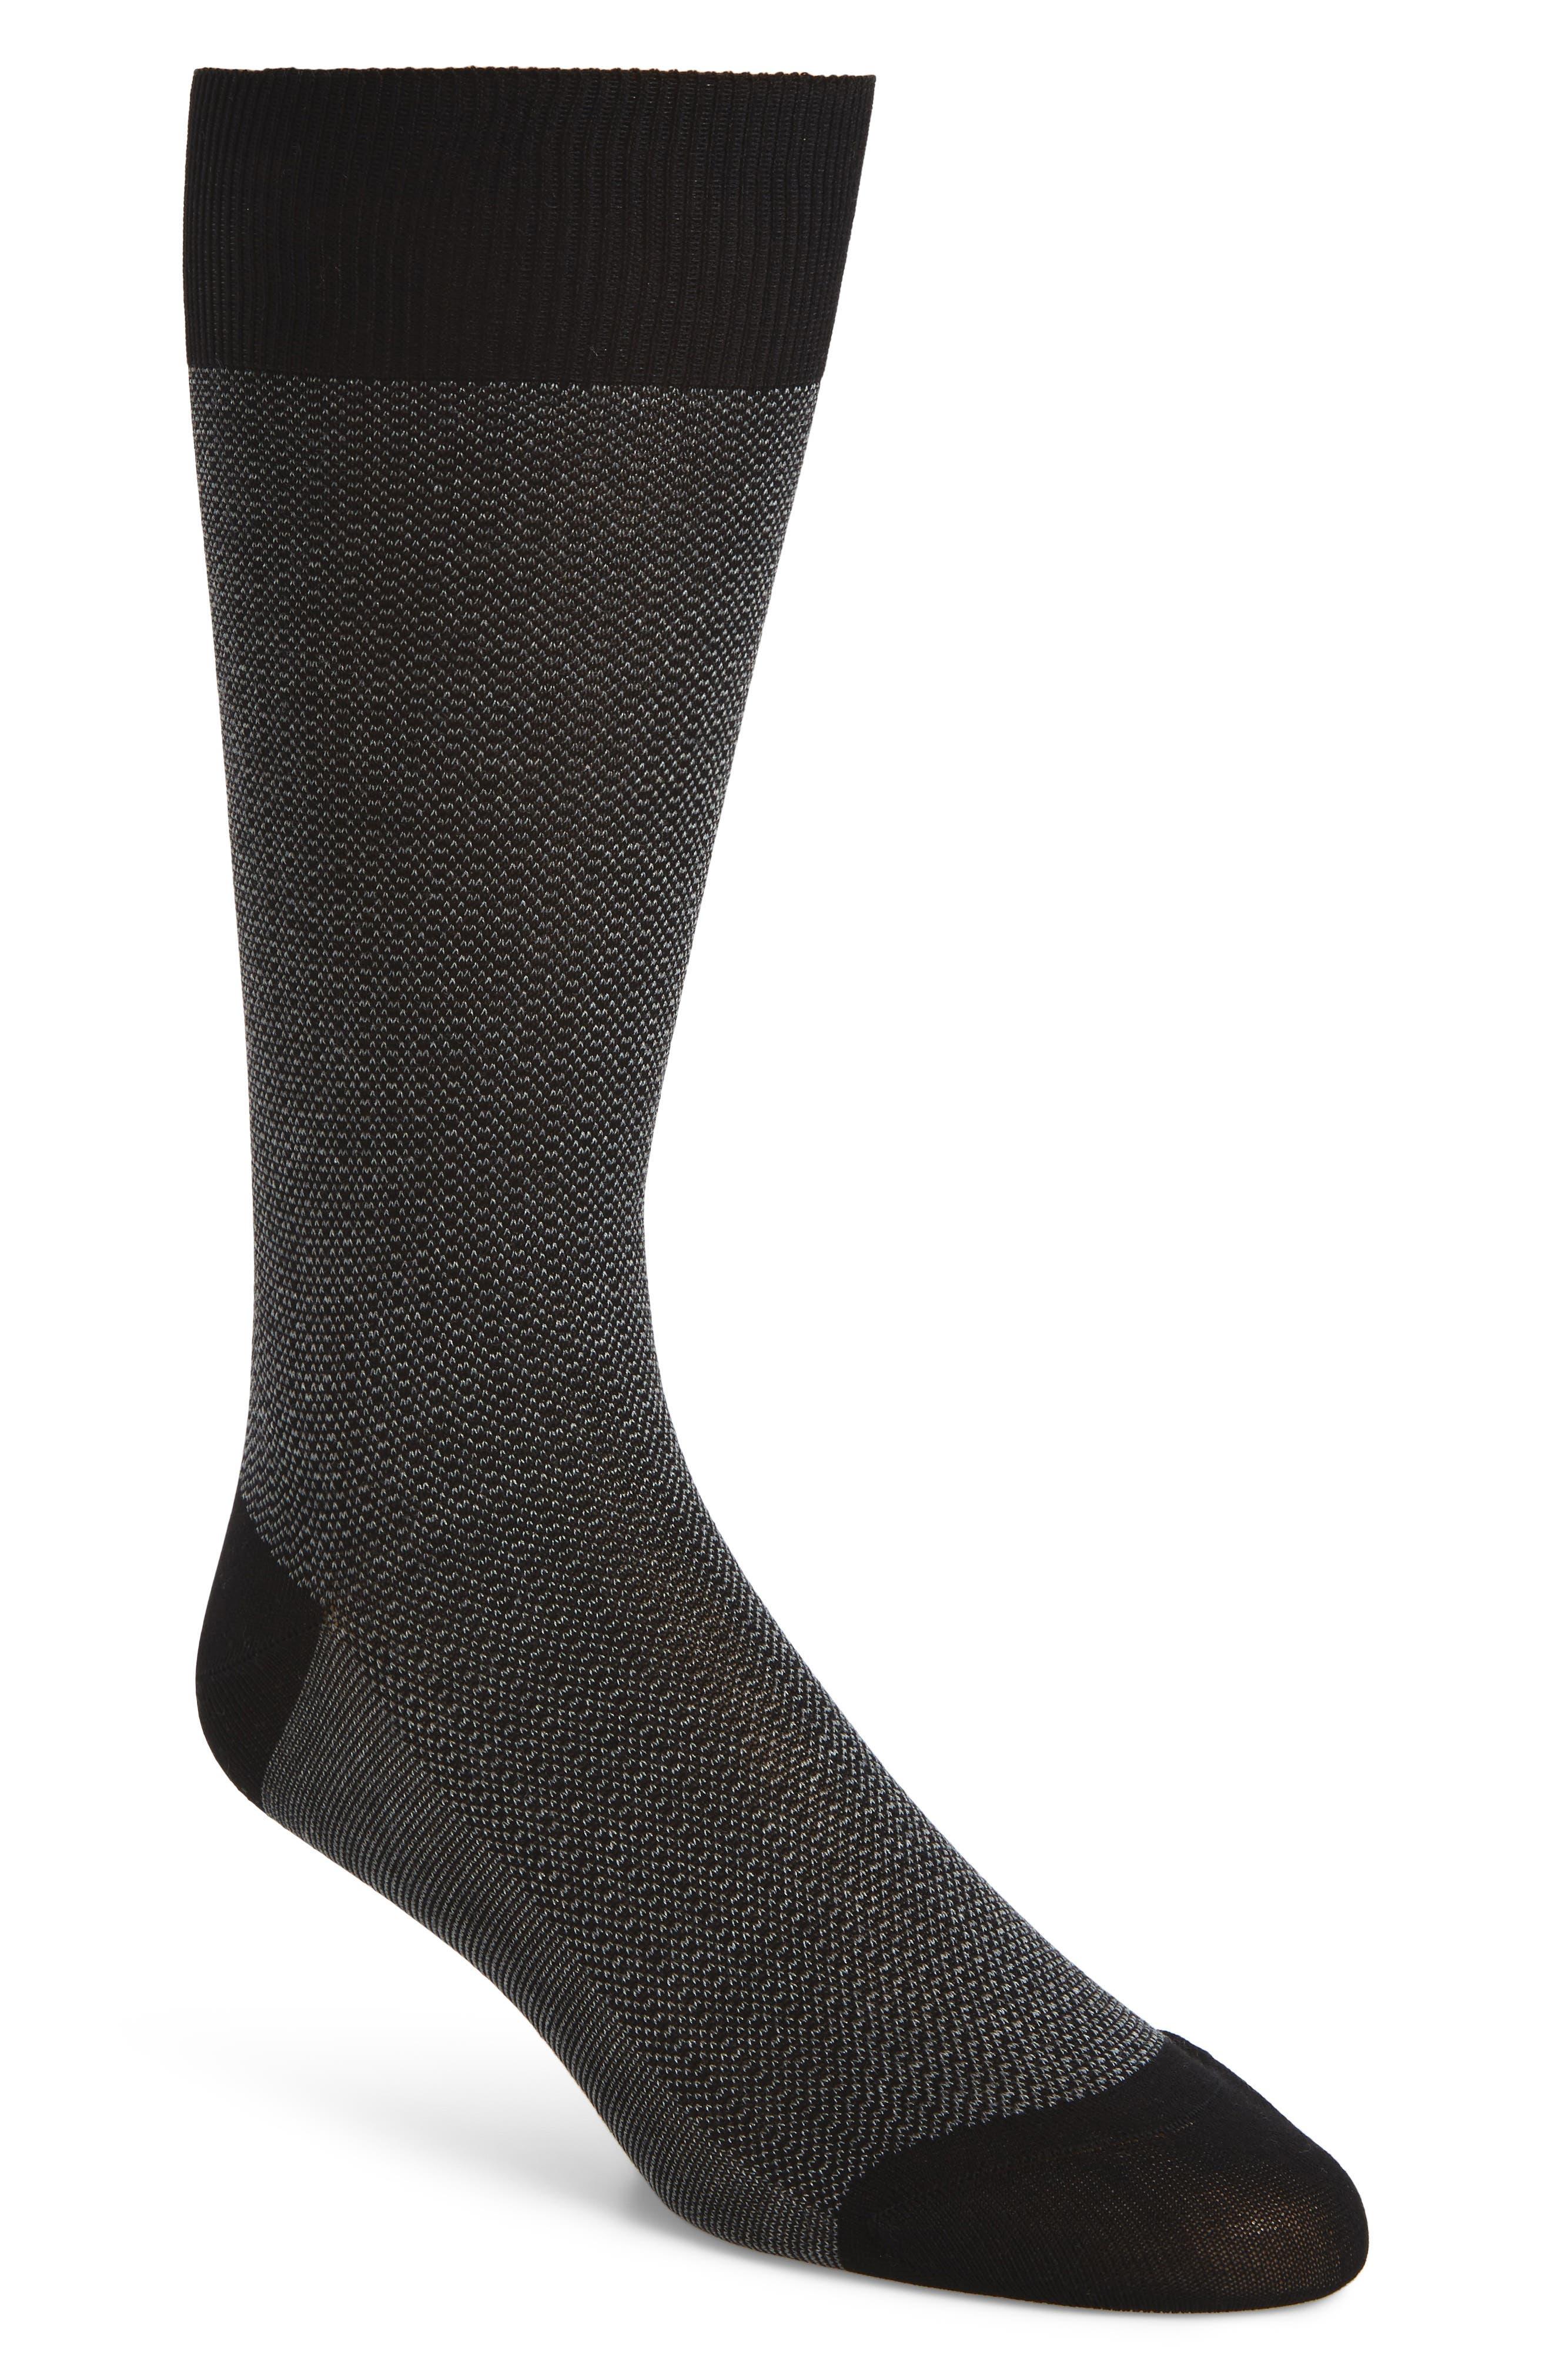 Pantherella Birdseye Stripe Socks